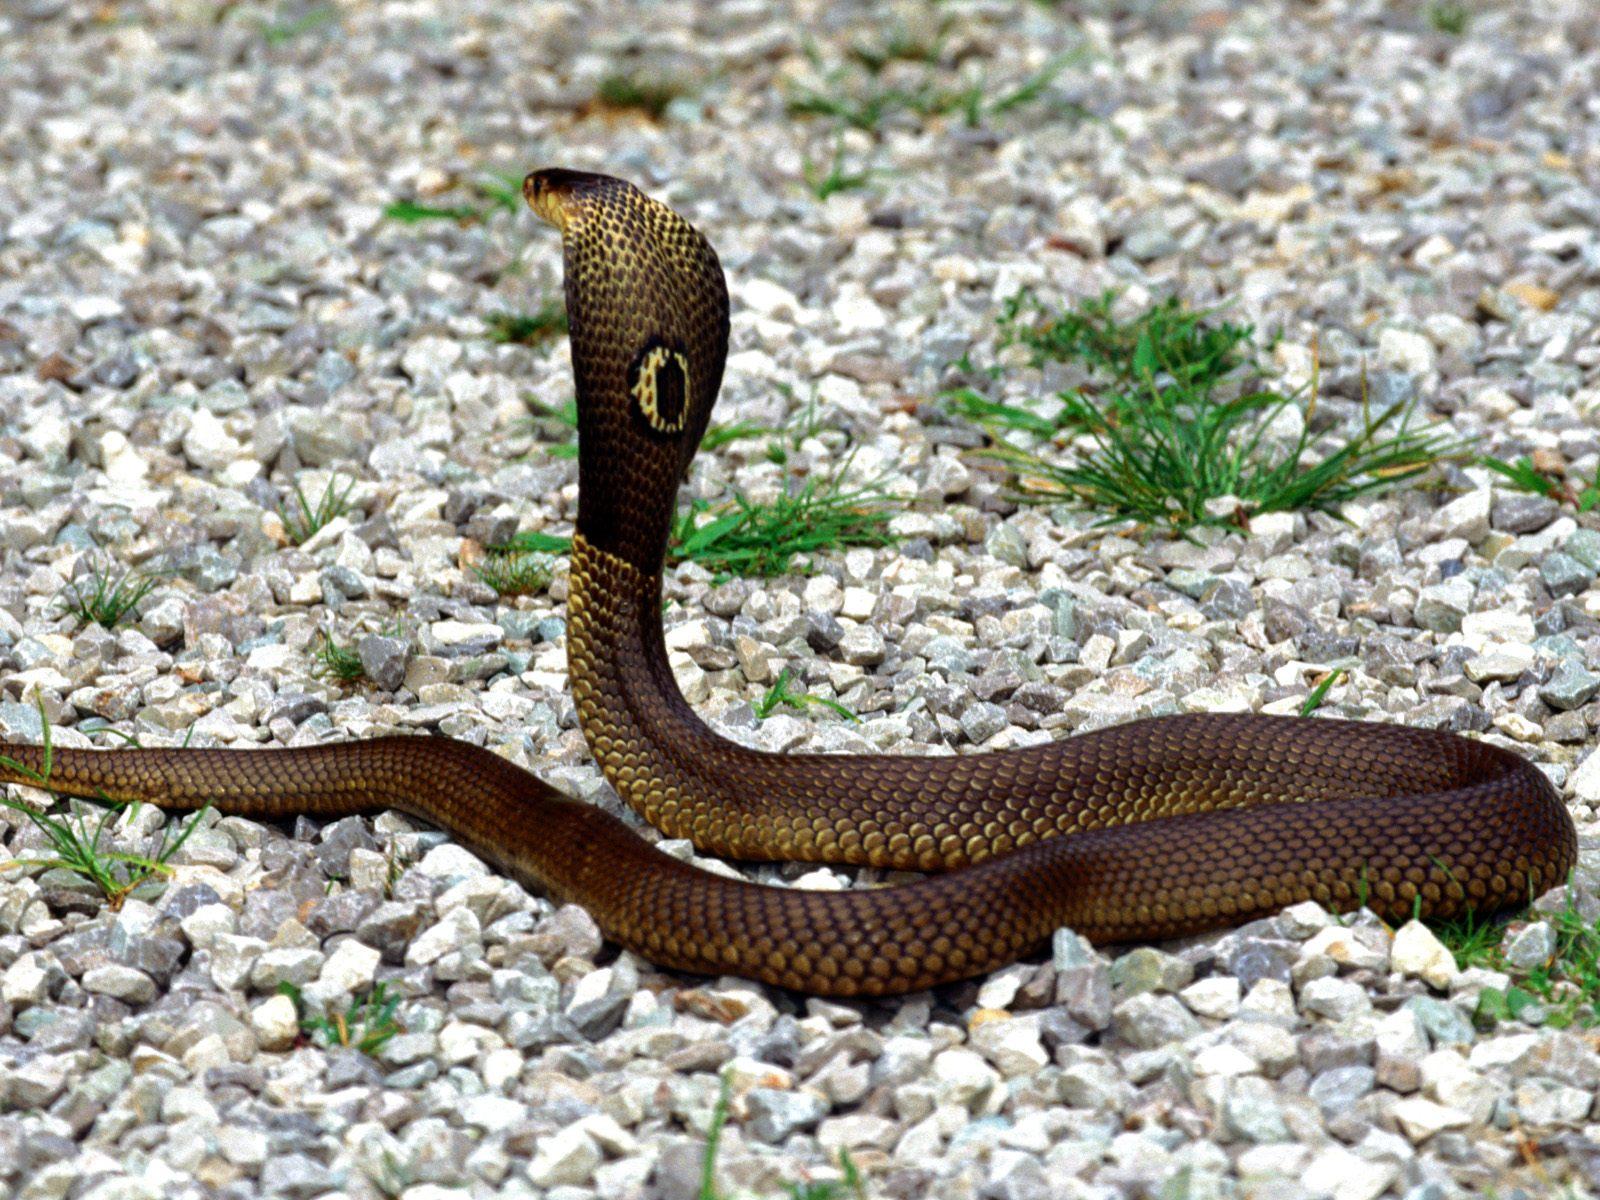 http://4.bp.blogspot.com/-hq_Wf1GxTeQ/Tti6Pdv-n8I/AAAAAAAABFI/HhJ5h0c7cmU/s1600/Snake-Charmer%2527s-Slithering-Protest.jpg